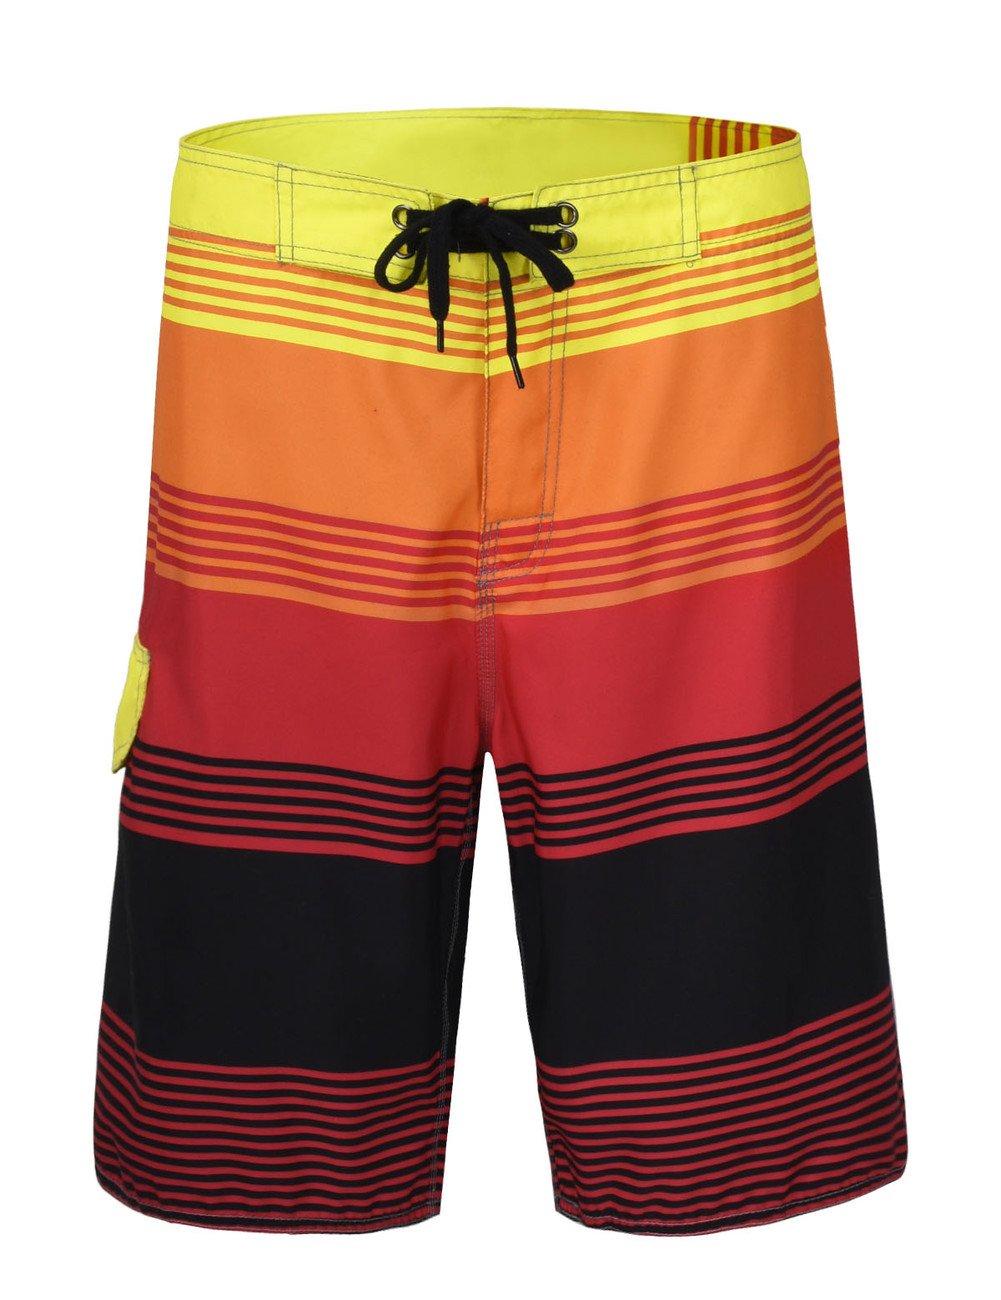 Nonwe Men's Striped Quick Dry Beachwear 16108-P